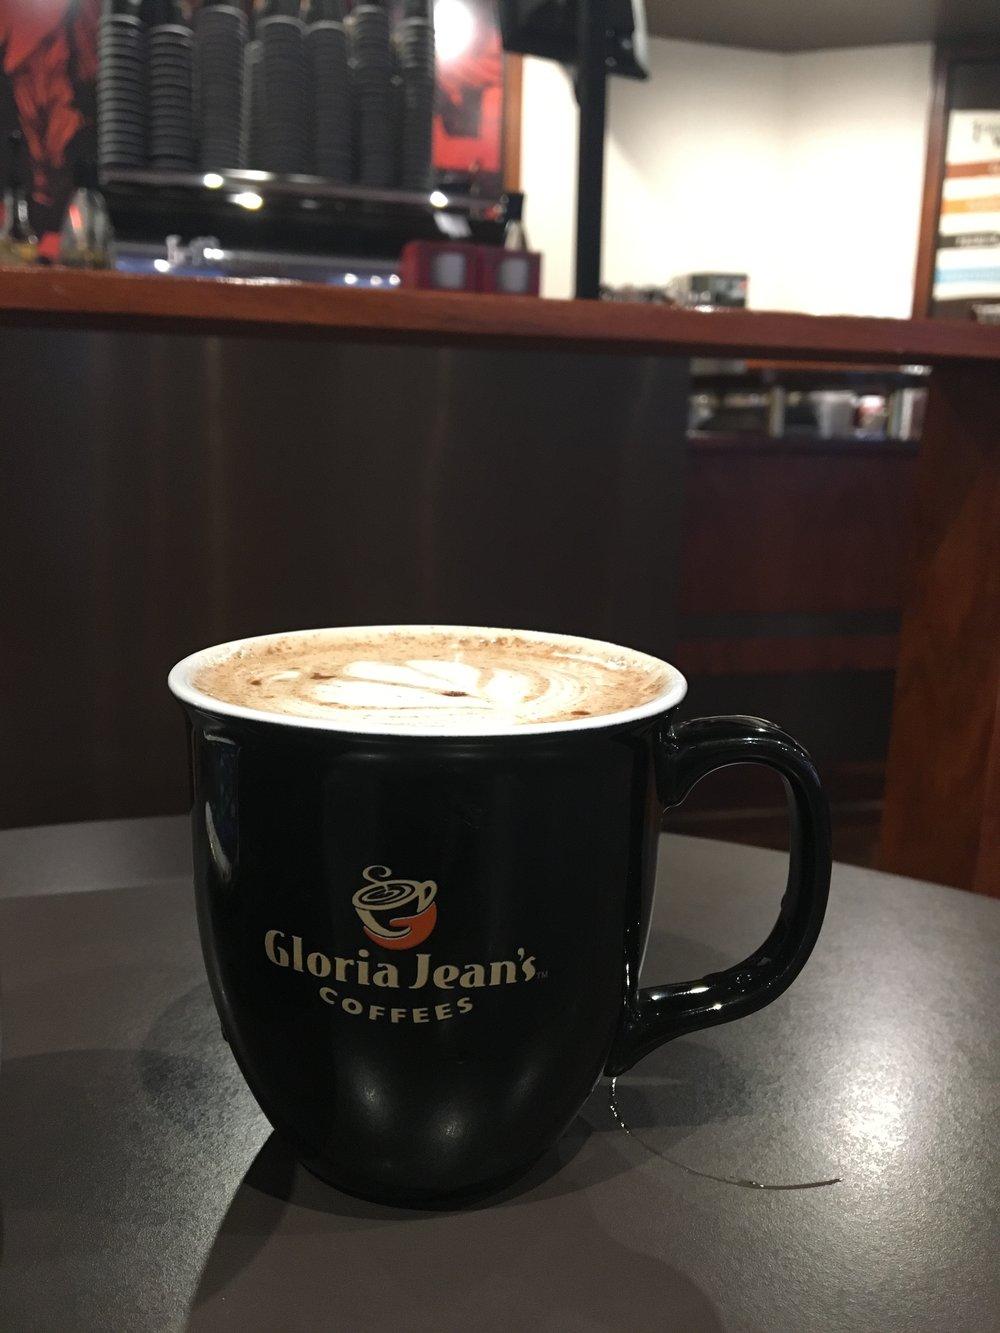 melbourne-gloria-jeans-coffee.JPG